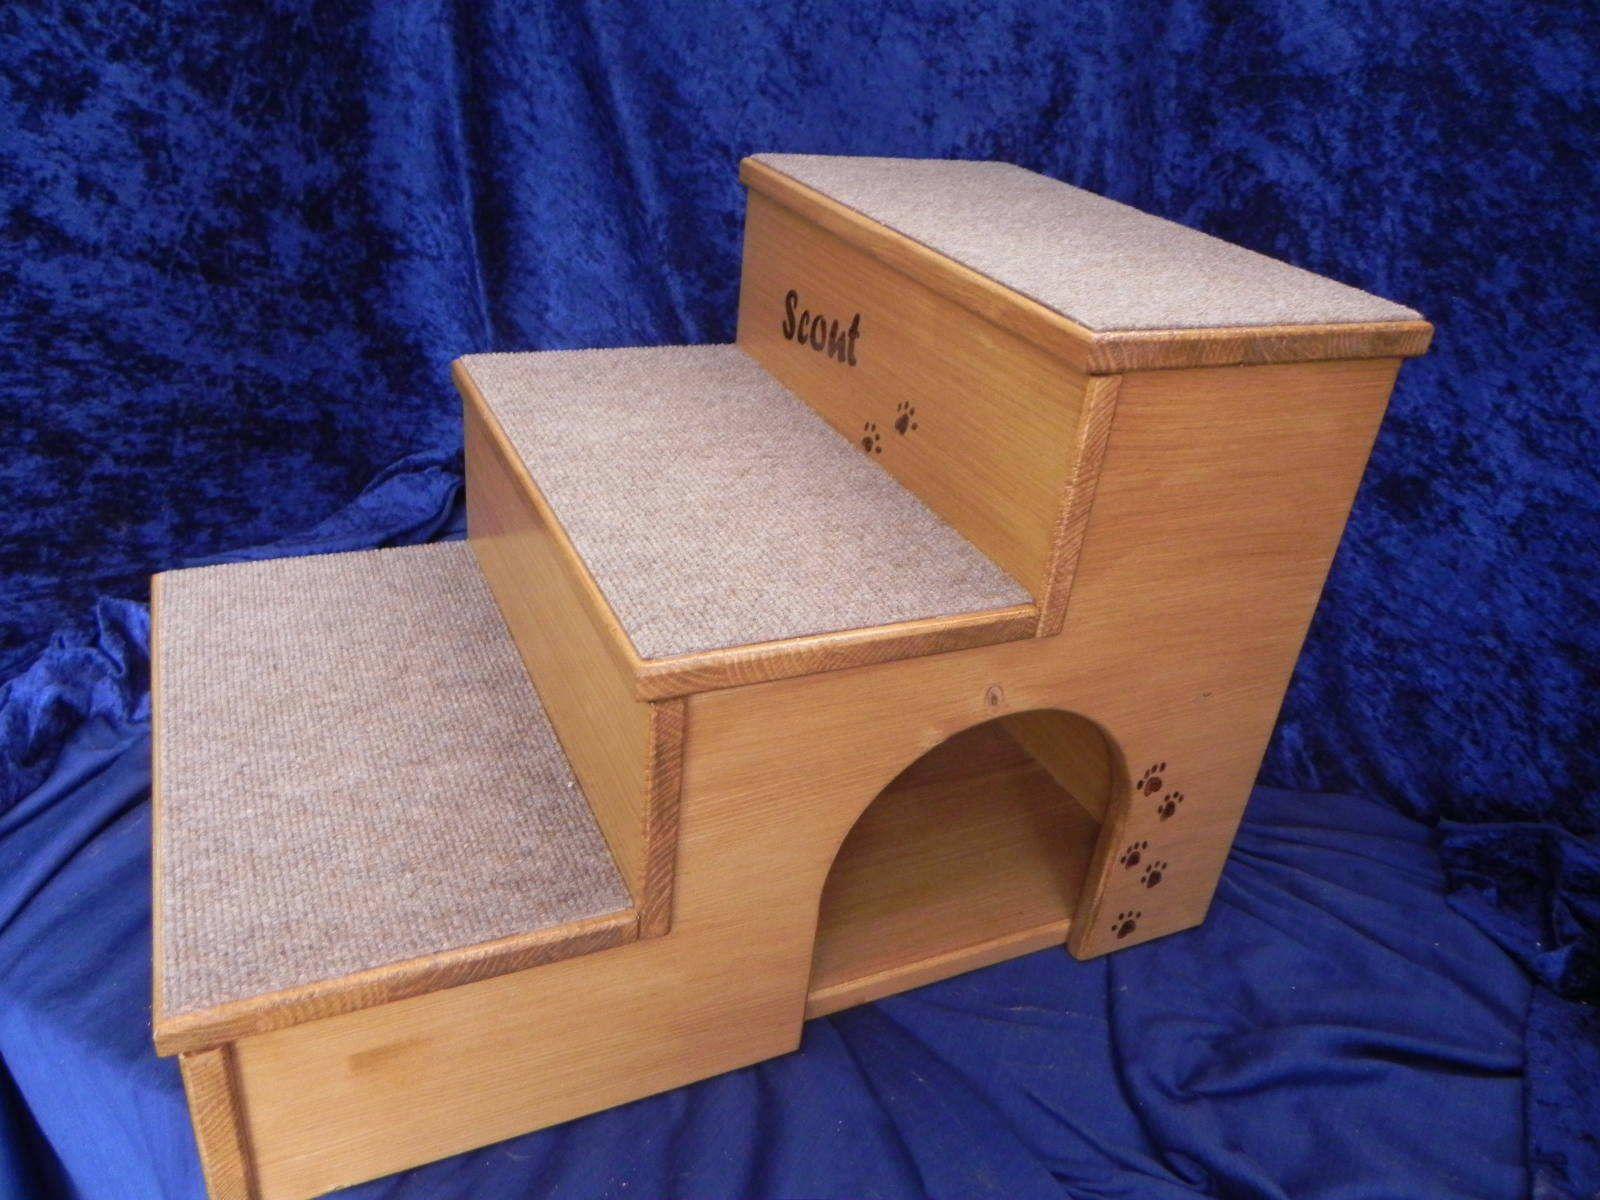 qualit ts hundetreppe mit integrierter kuschelh hle in allen farben lieferbar ebay basteln. Black Bedroom Furniture Sets. Home Design Ideas